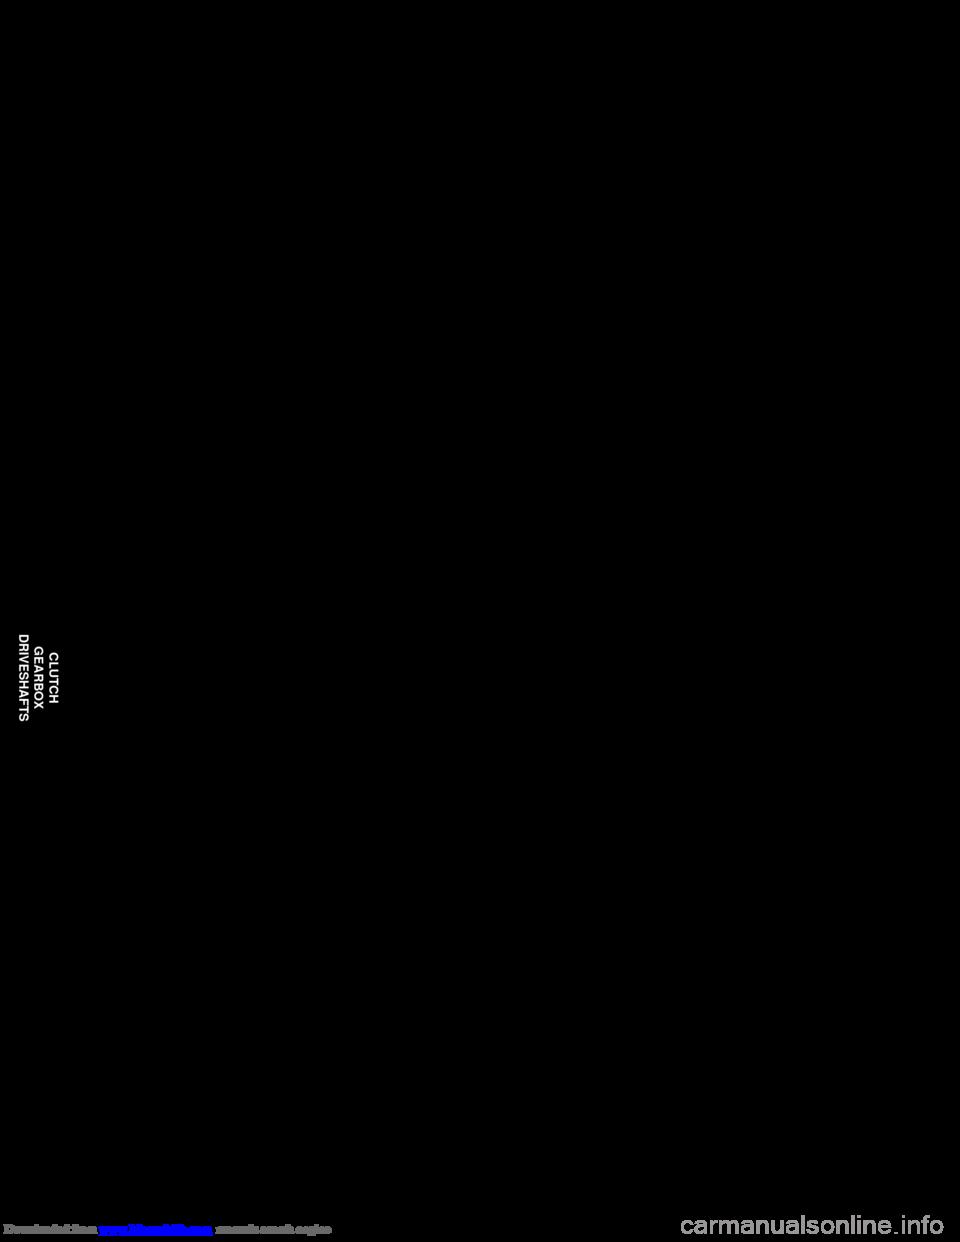 Brake Sensor Citroen C5 2000 Dc De 1g Owners Manual Engine Diagram Page